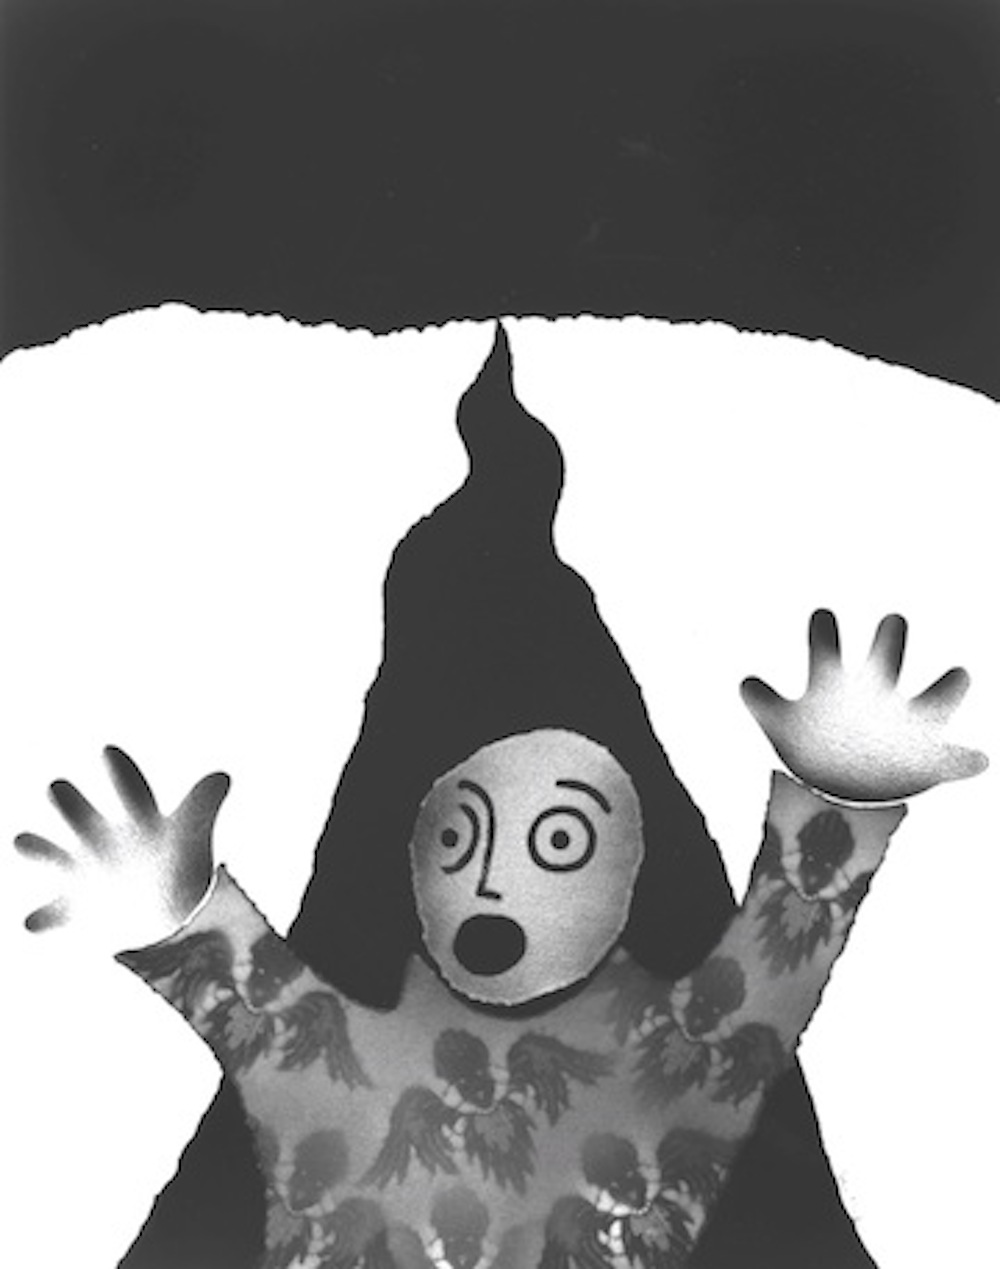 irena-martens-collage-screaming-for-eward-munch1989